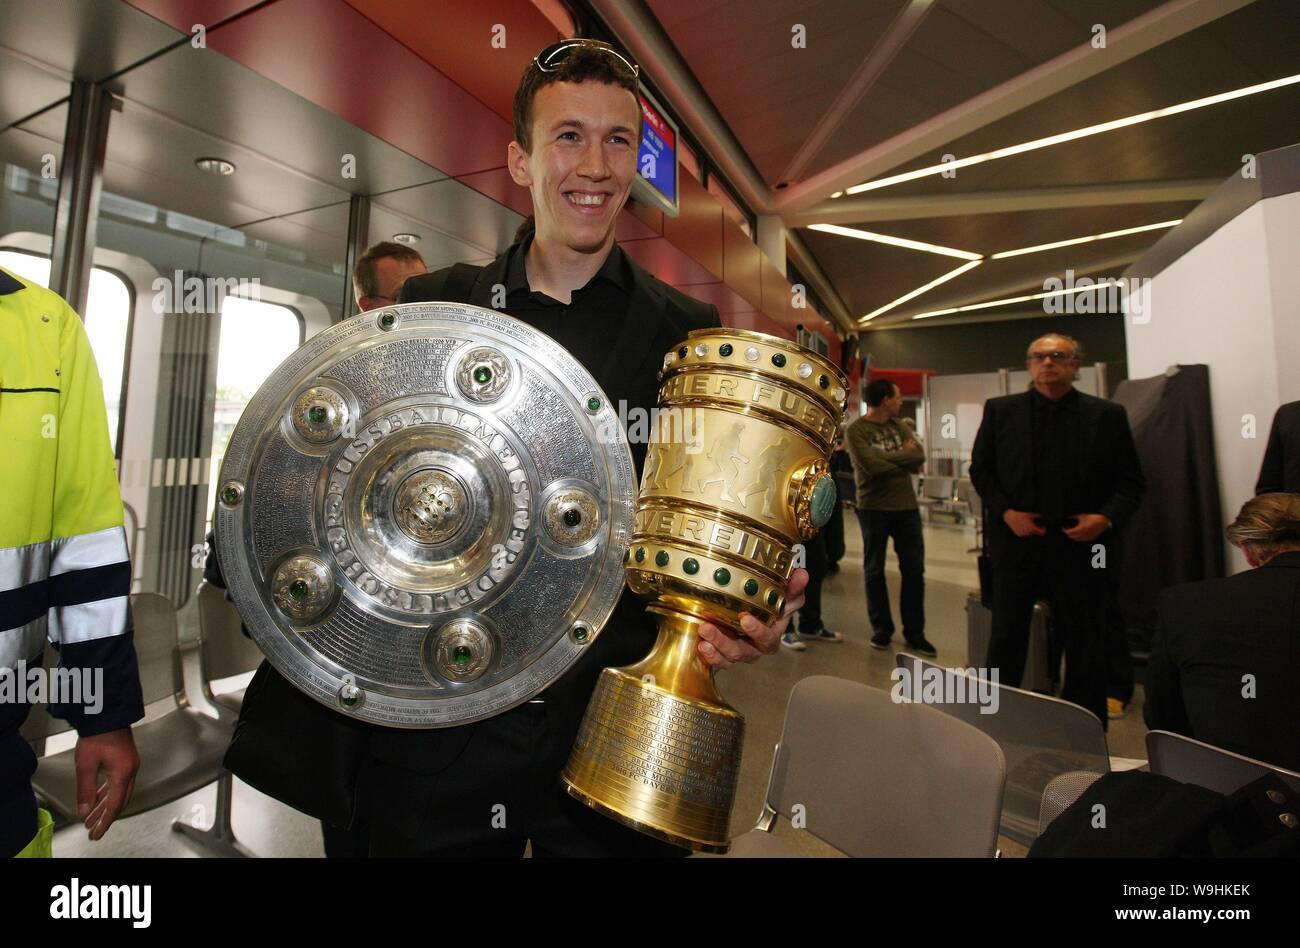 Borussia Dortmund DFB-Pokal 2012